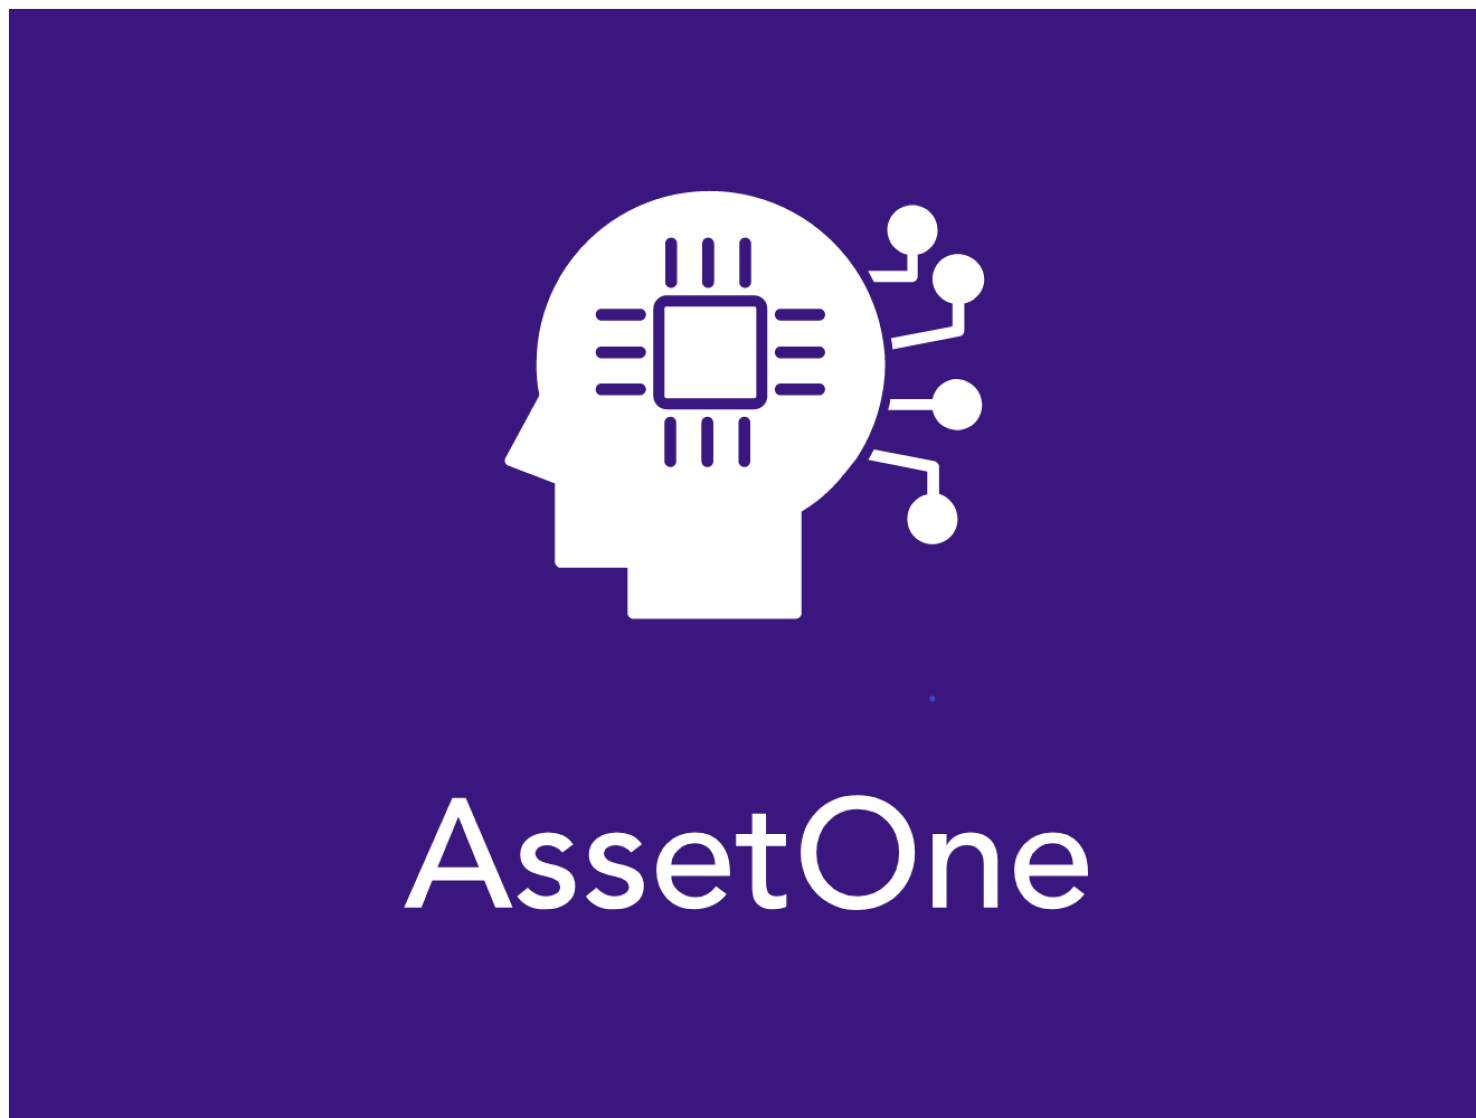 Asset One